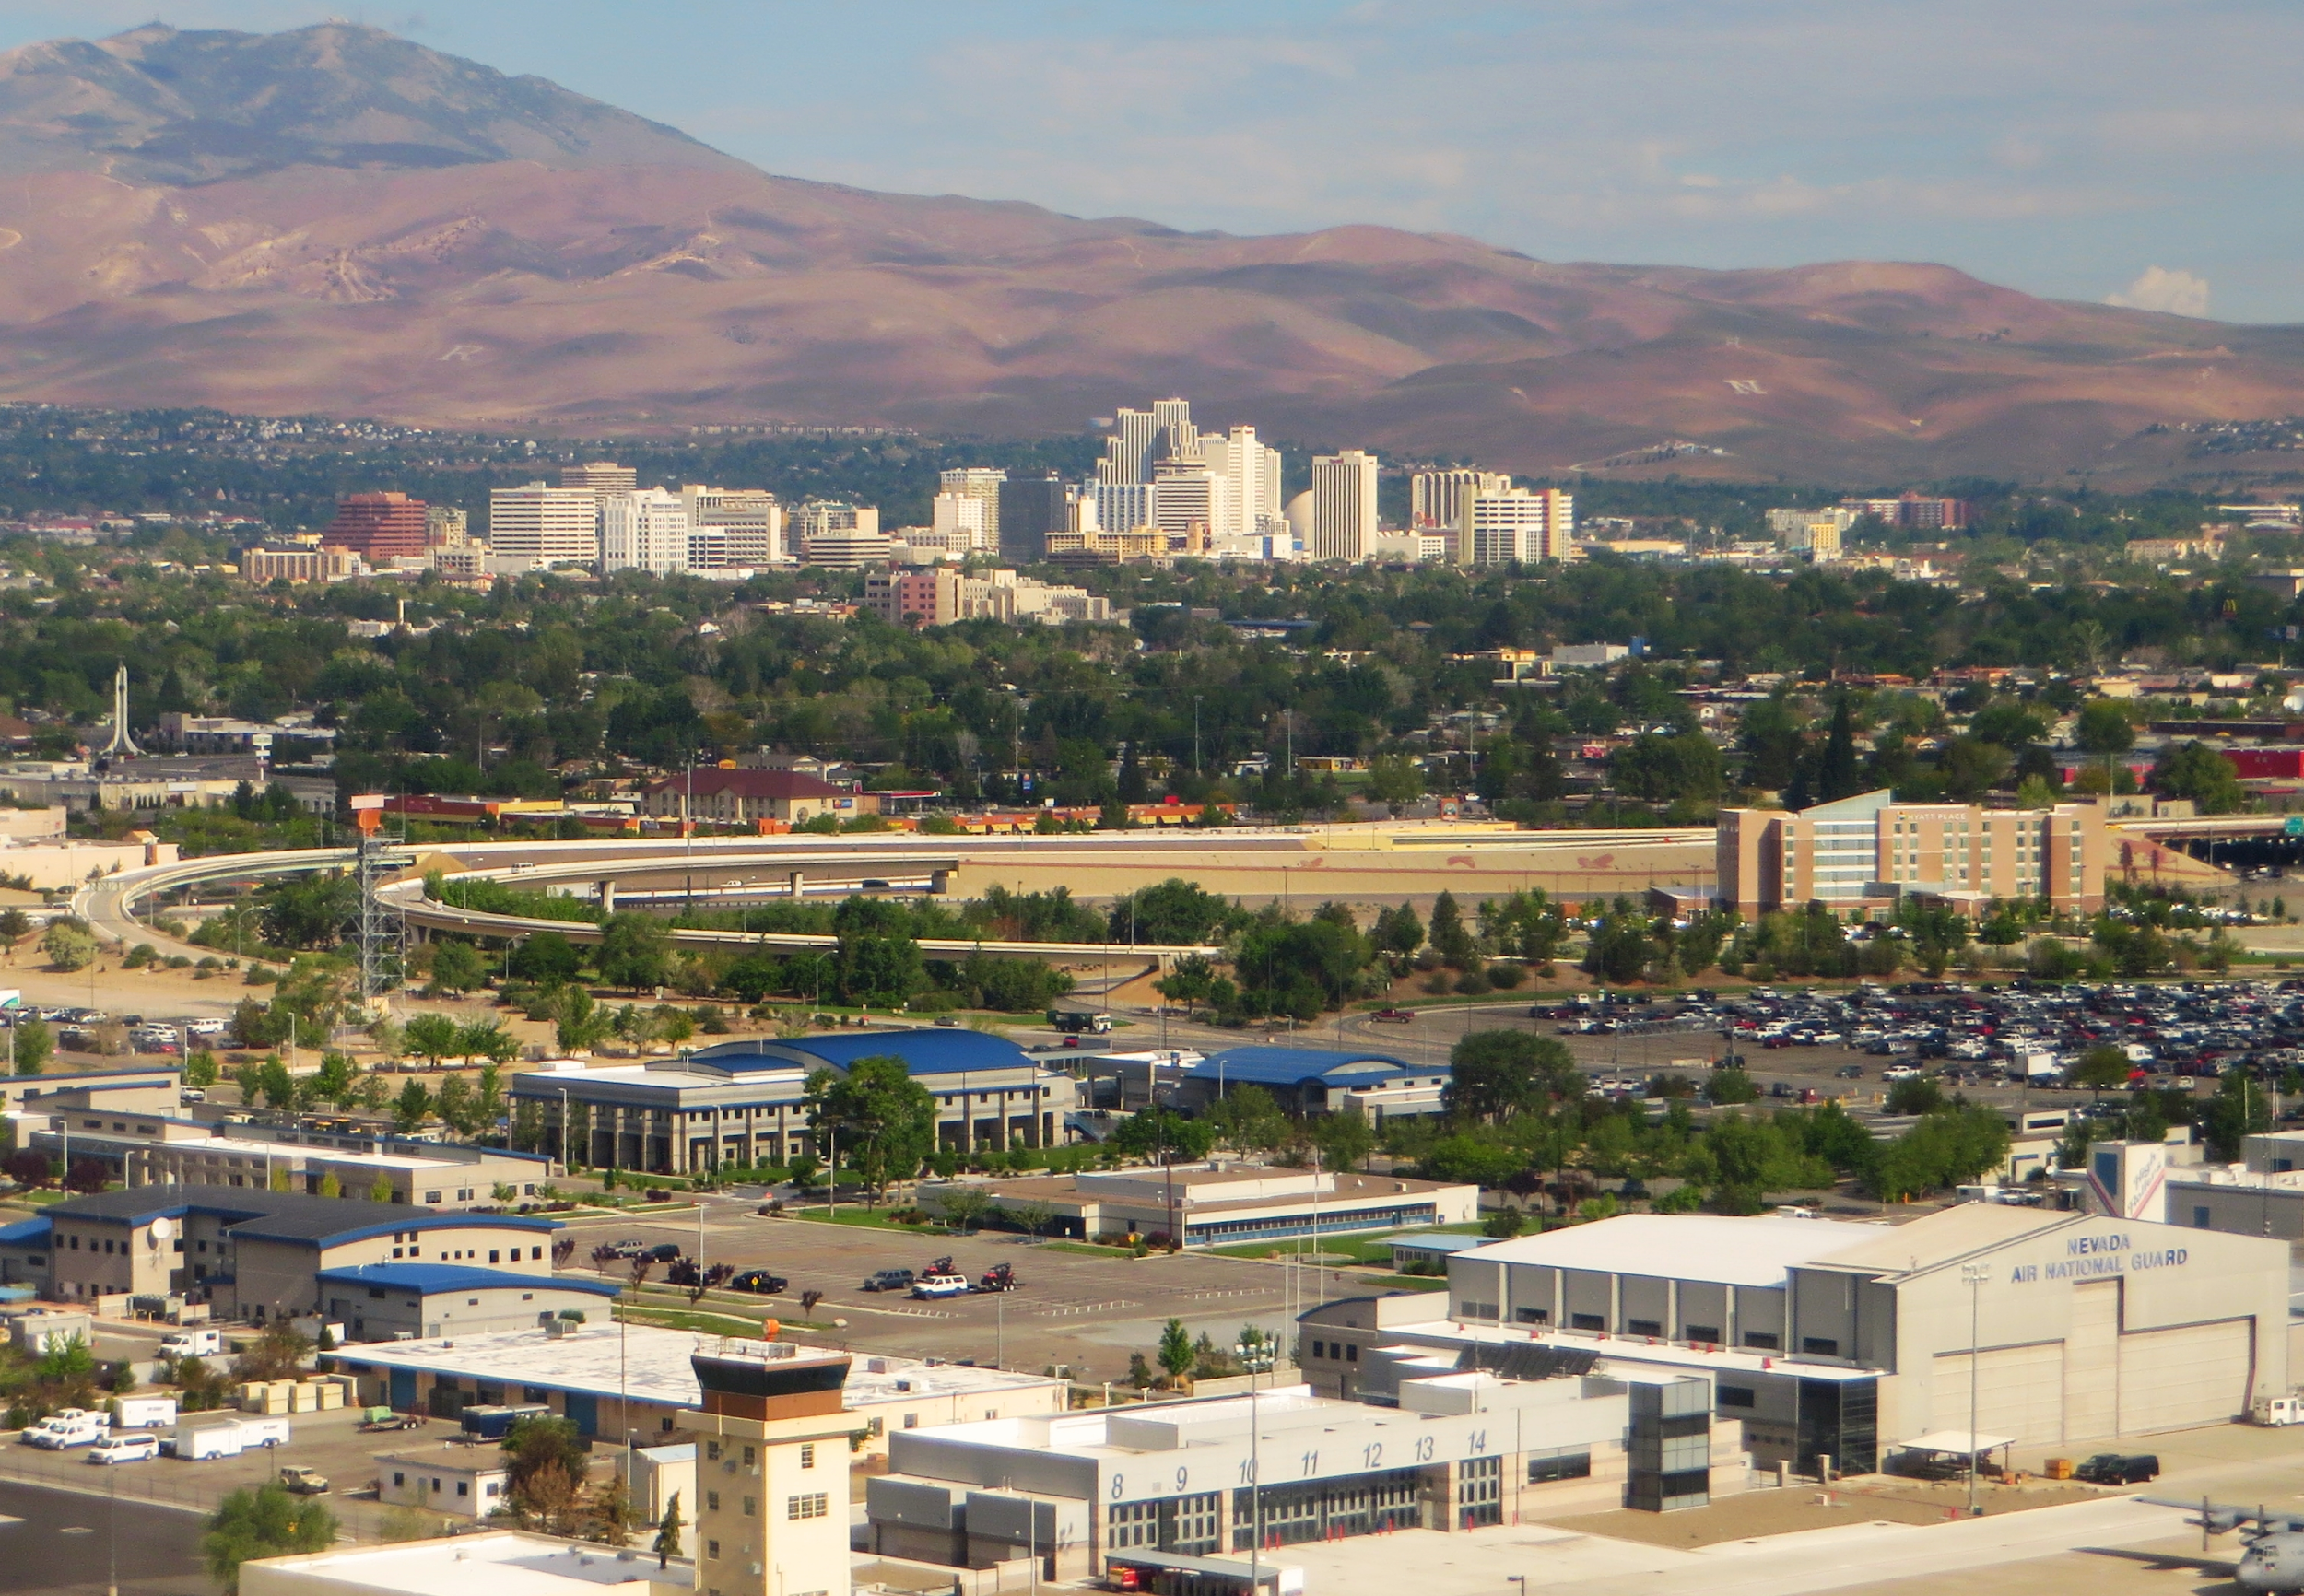 photograph of Reno, Nevada